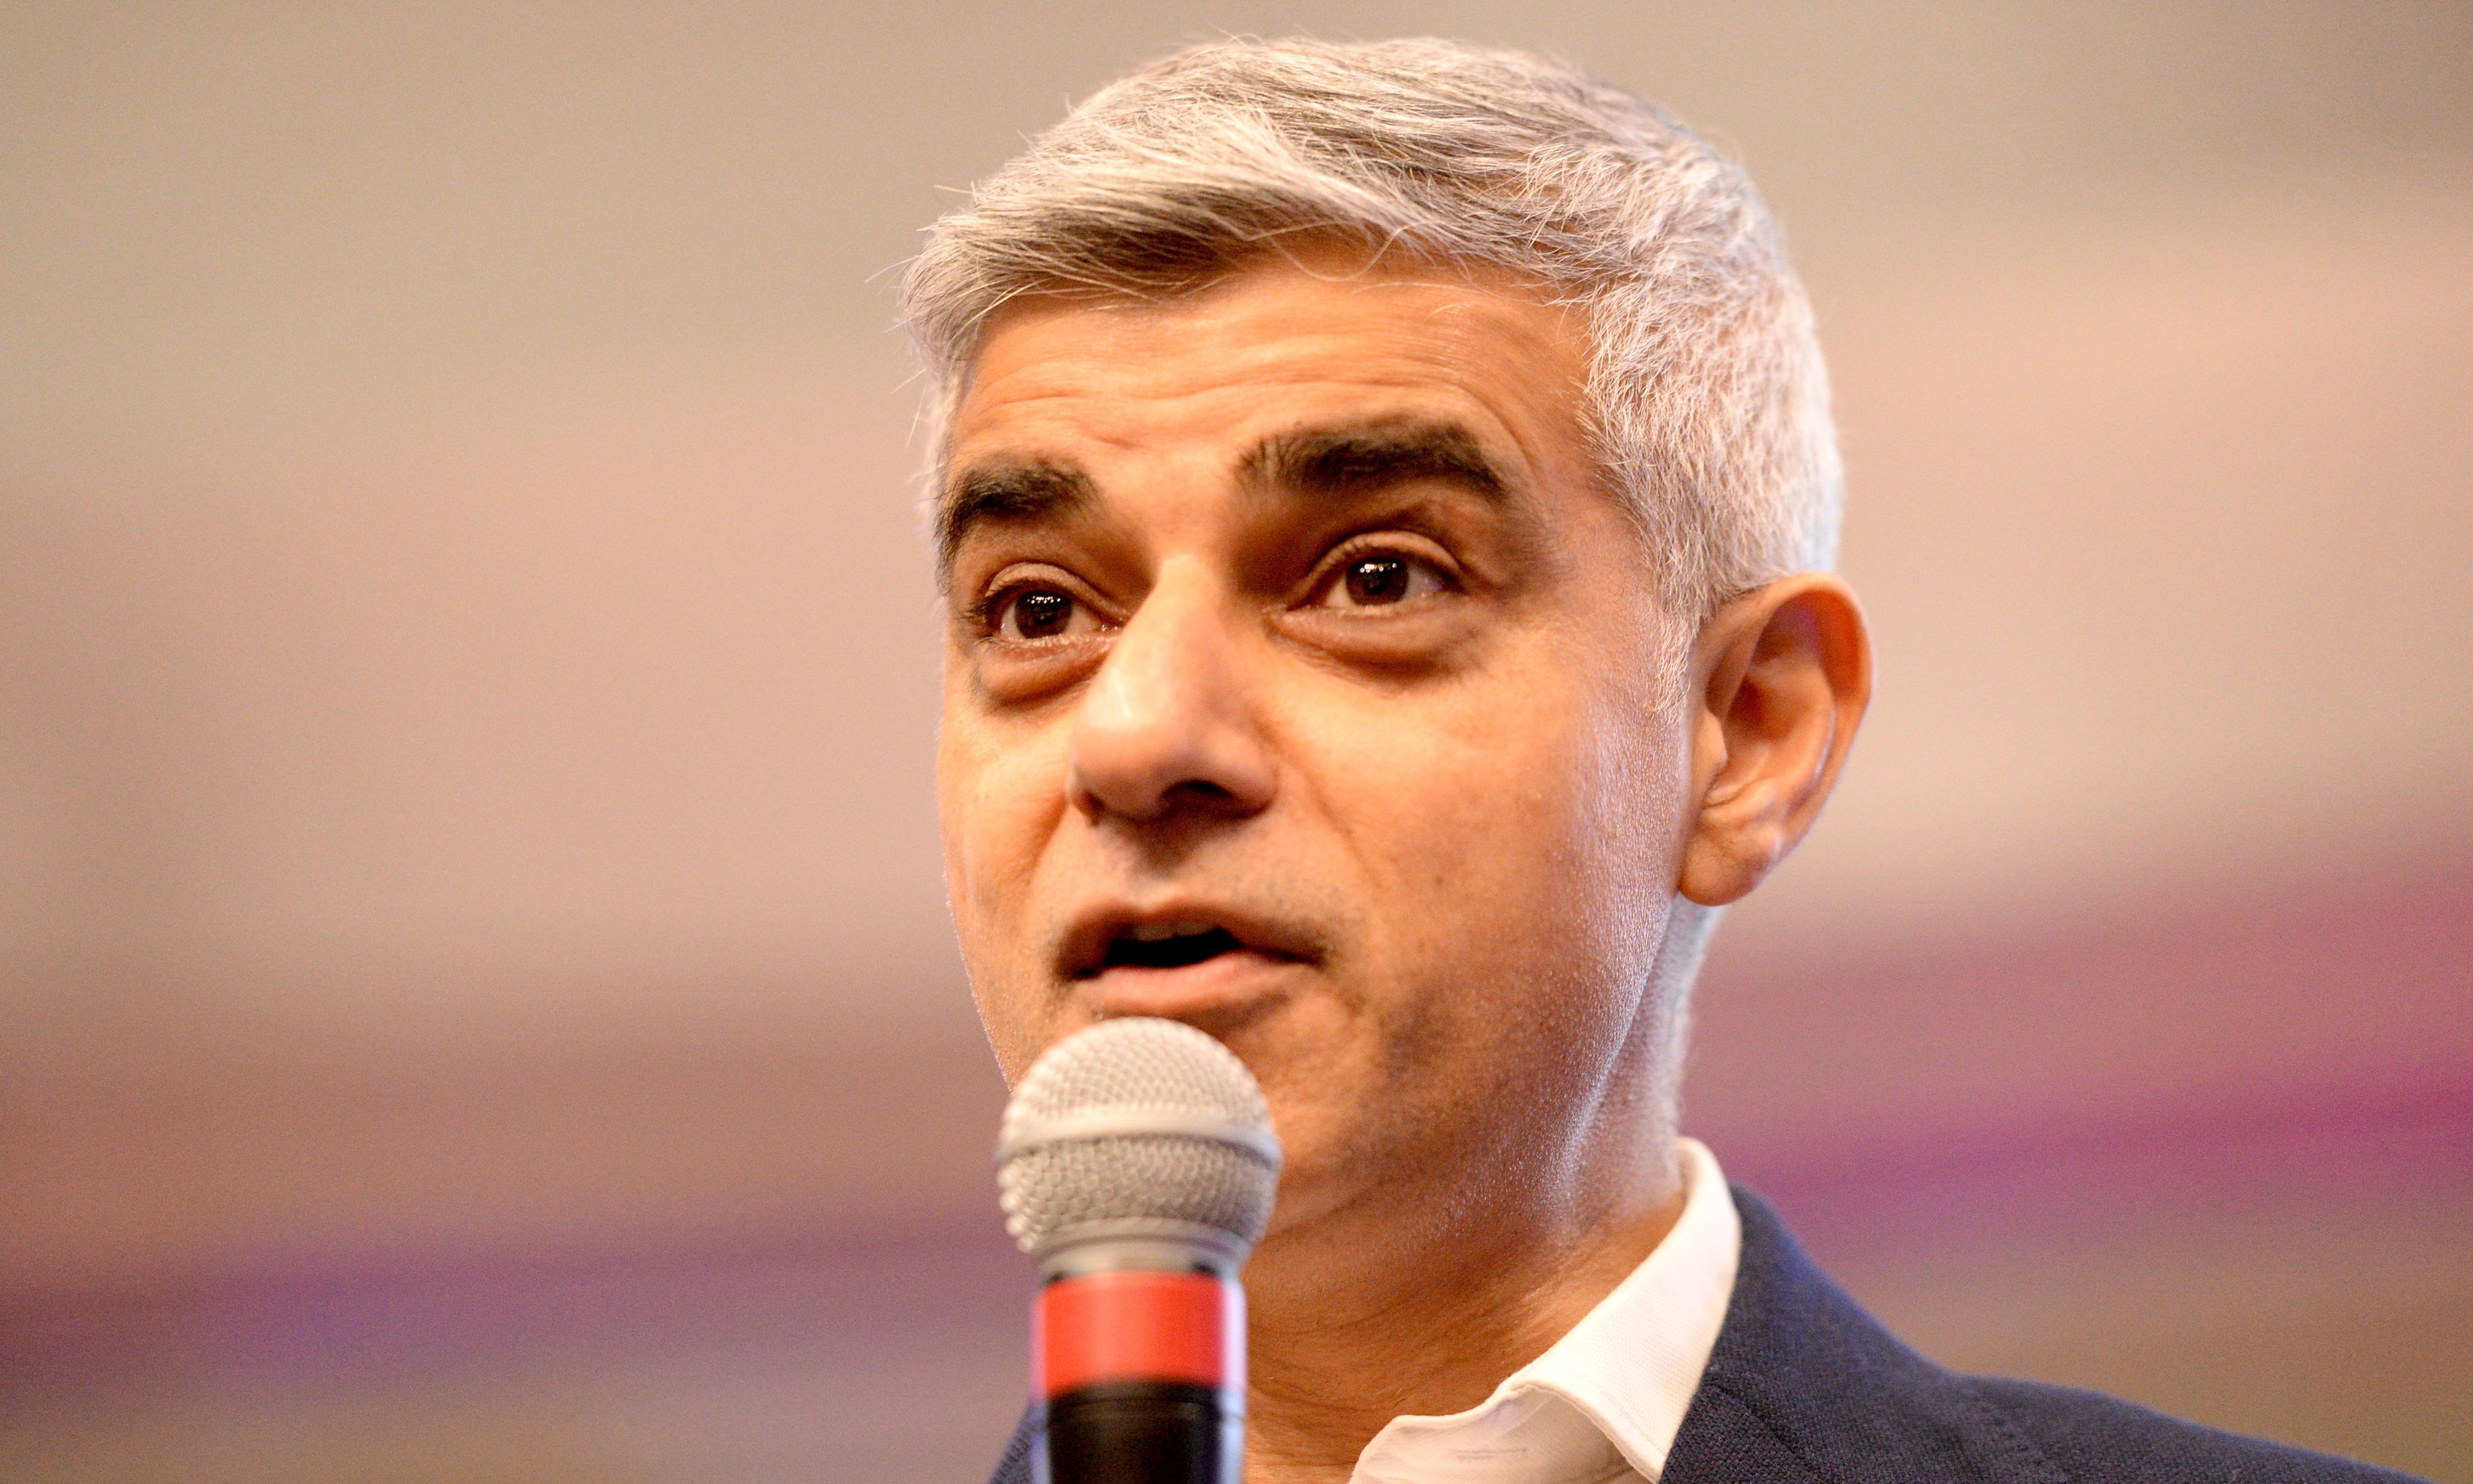 Sadiq Khan sets up £50m fund to reduce emissions in London